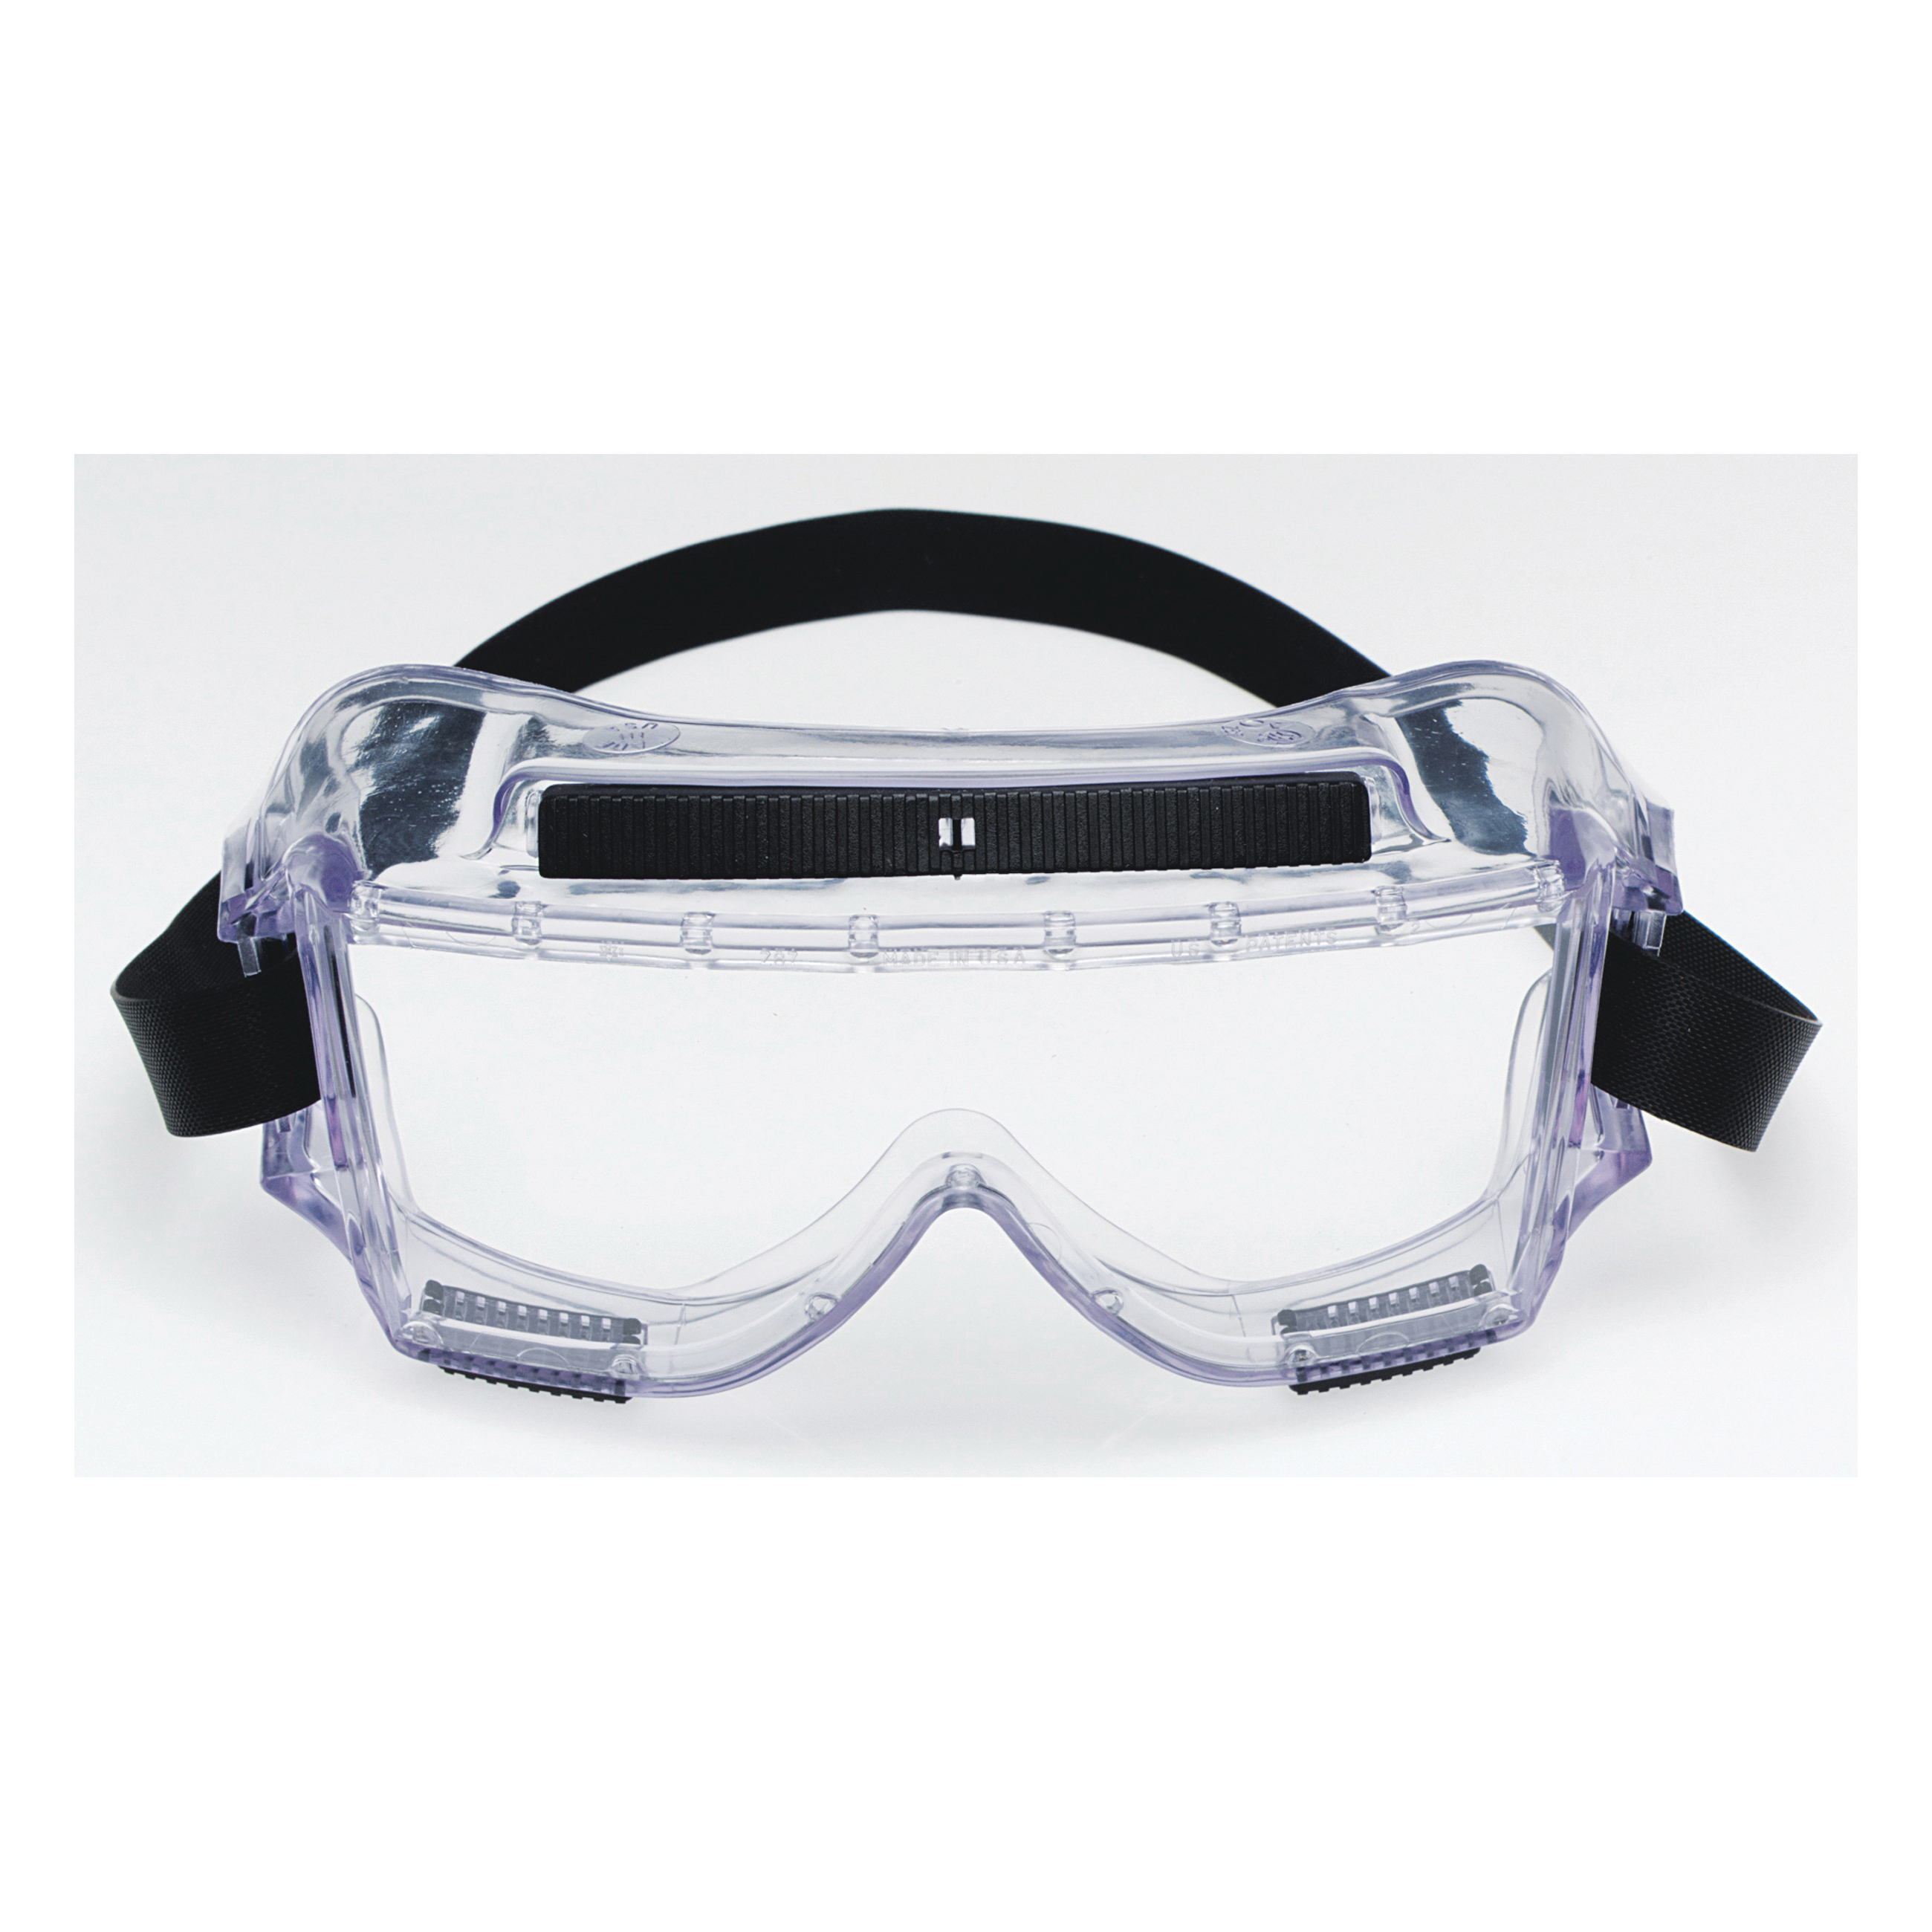 3M™ Centurion™ 078371-62390 Standard Value Safety Goggles, Anti-Fog Clear Polycarbonate Lens, 99.9 % UV Protection, Neoprene Strap, CSA Z94.3-2007, ANSI Z87.1-2003